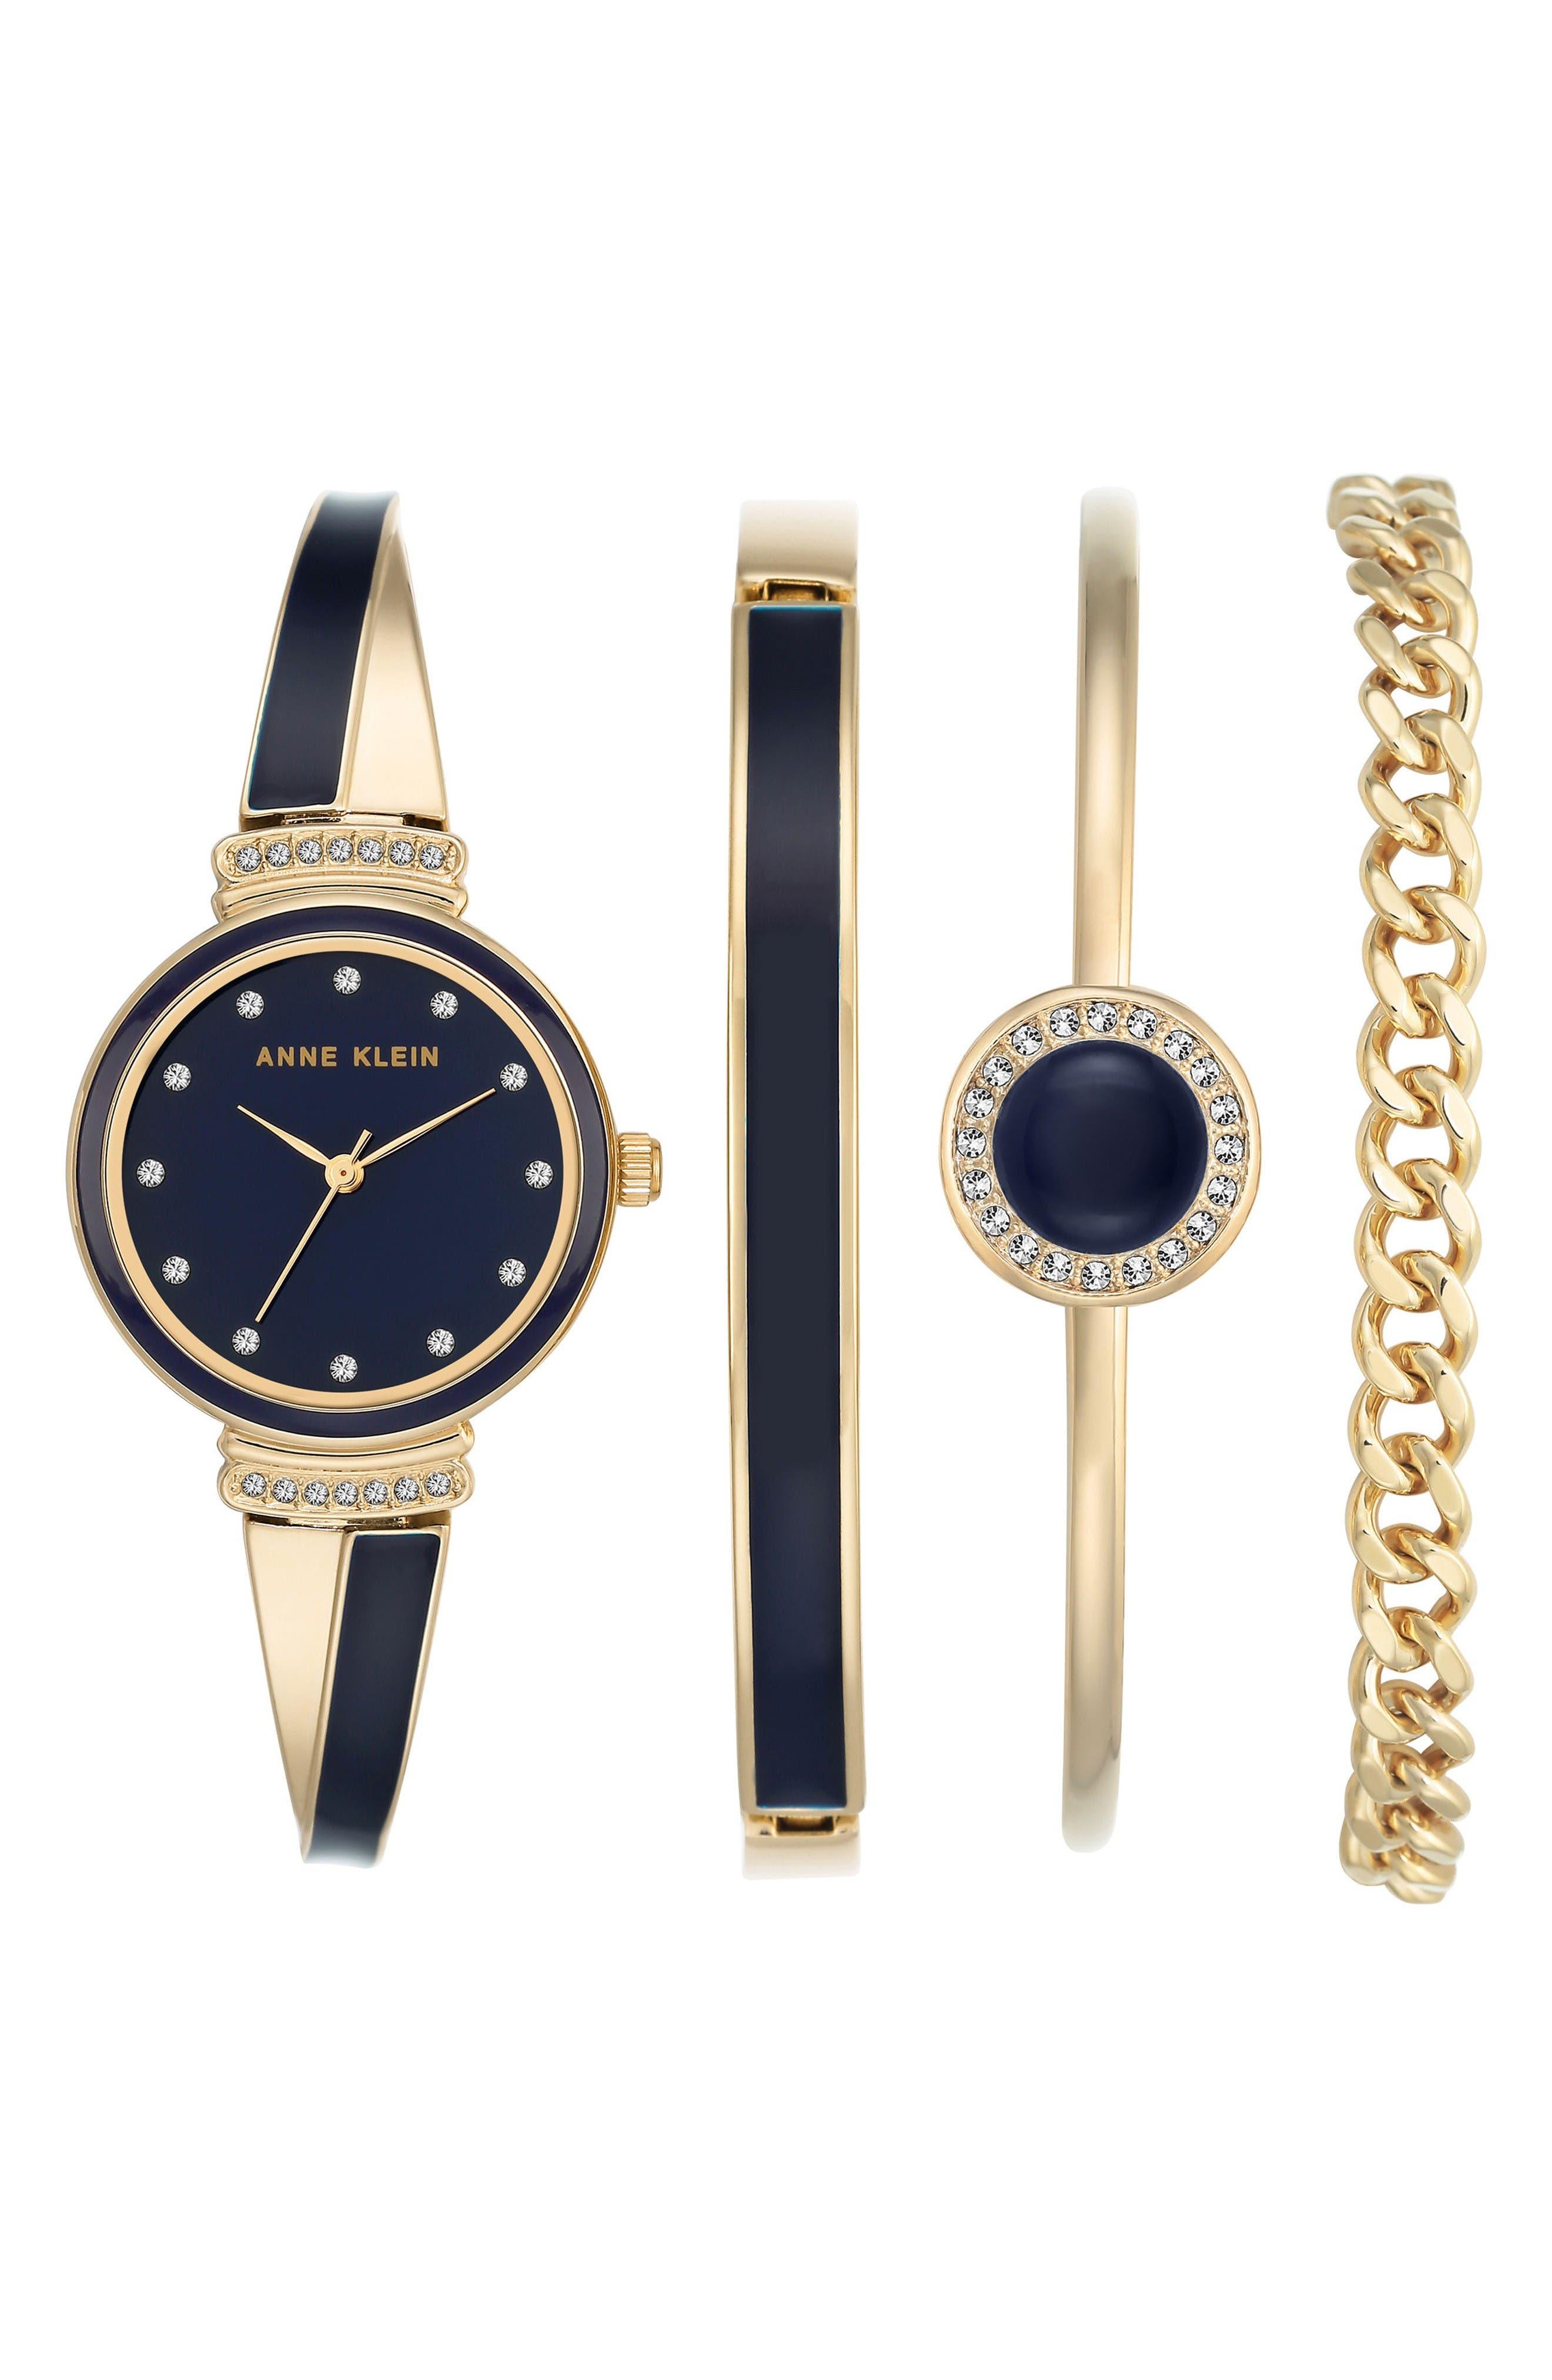 ANNE KLEIN Bangle Watch & Bracelet Set, 26mm